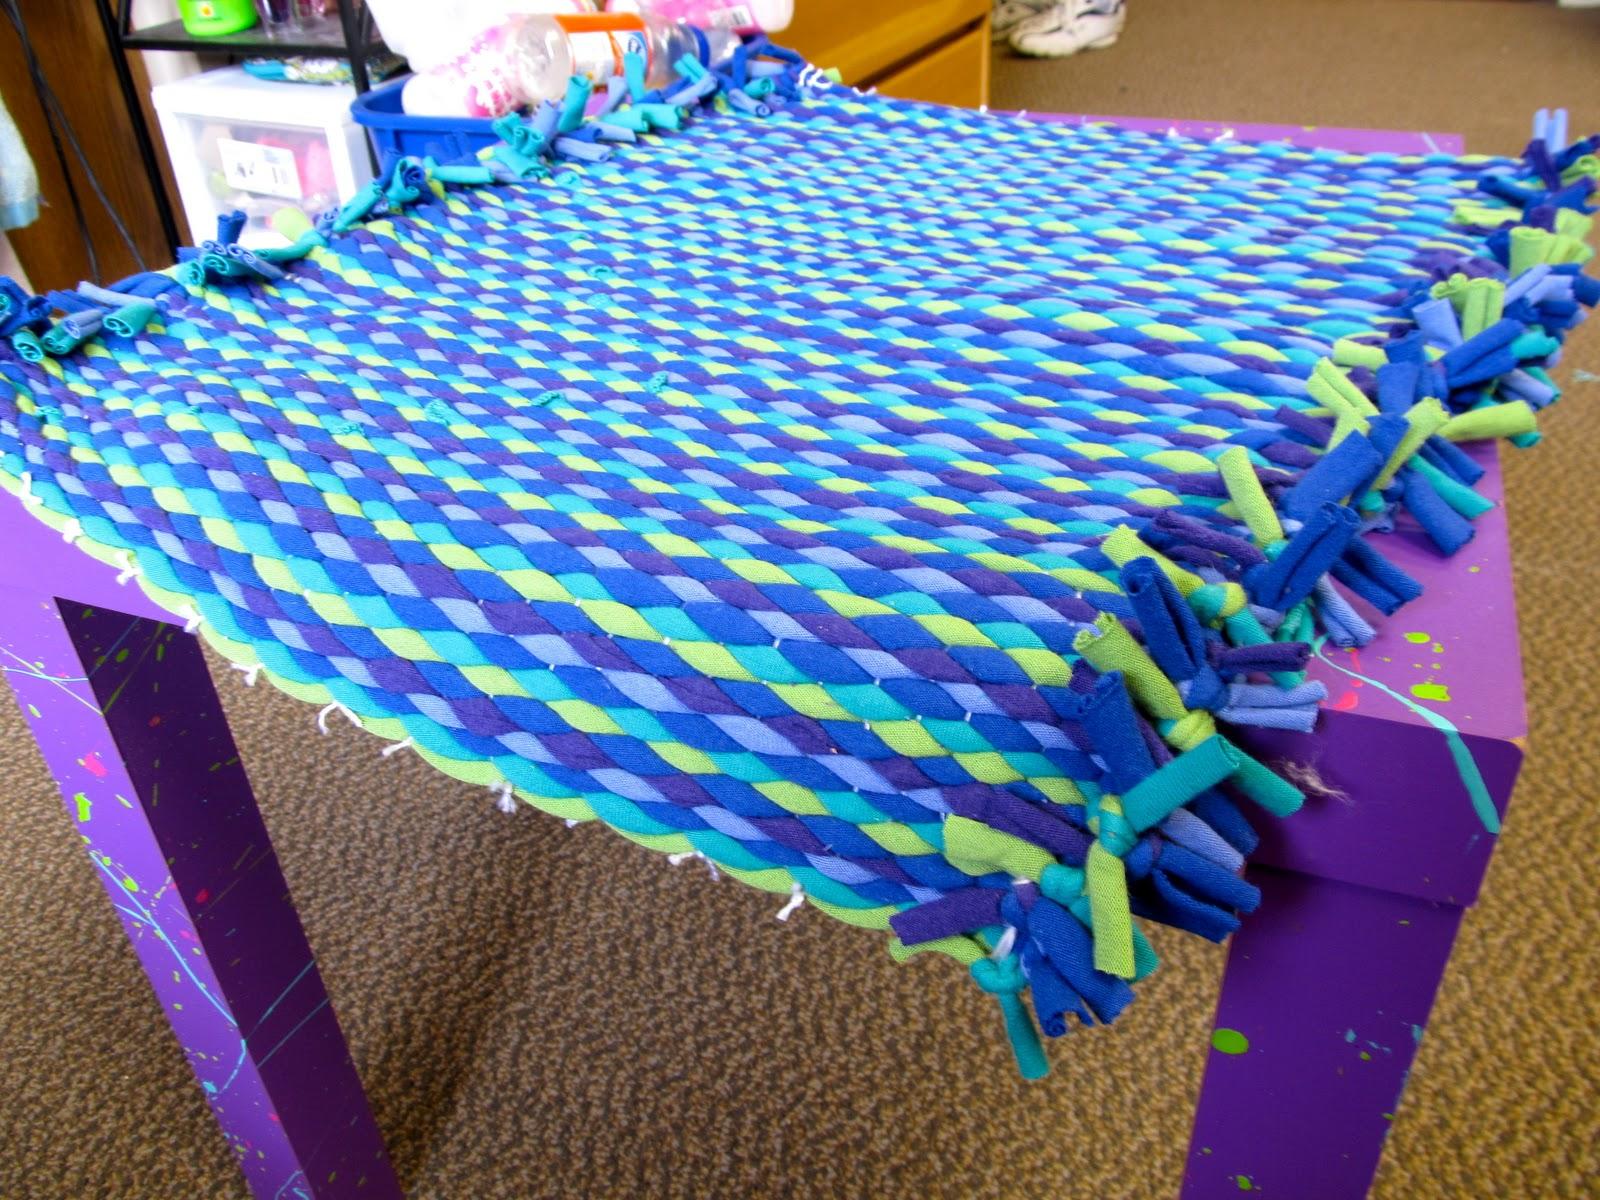 rachel alex craft how to t shirt rag rug